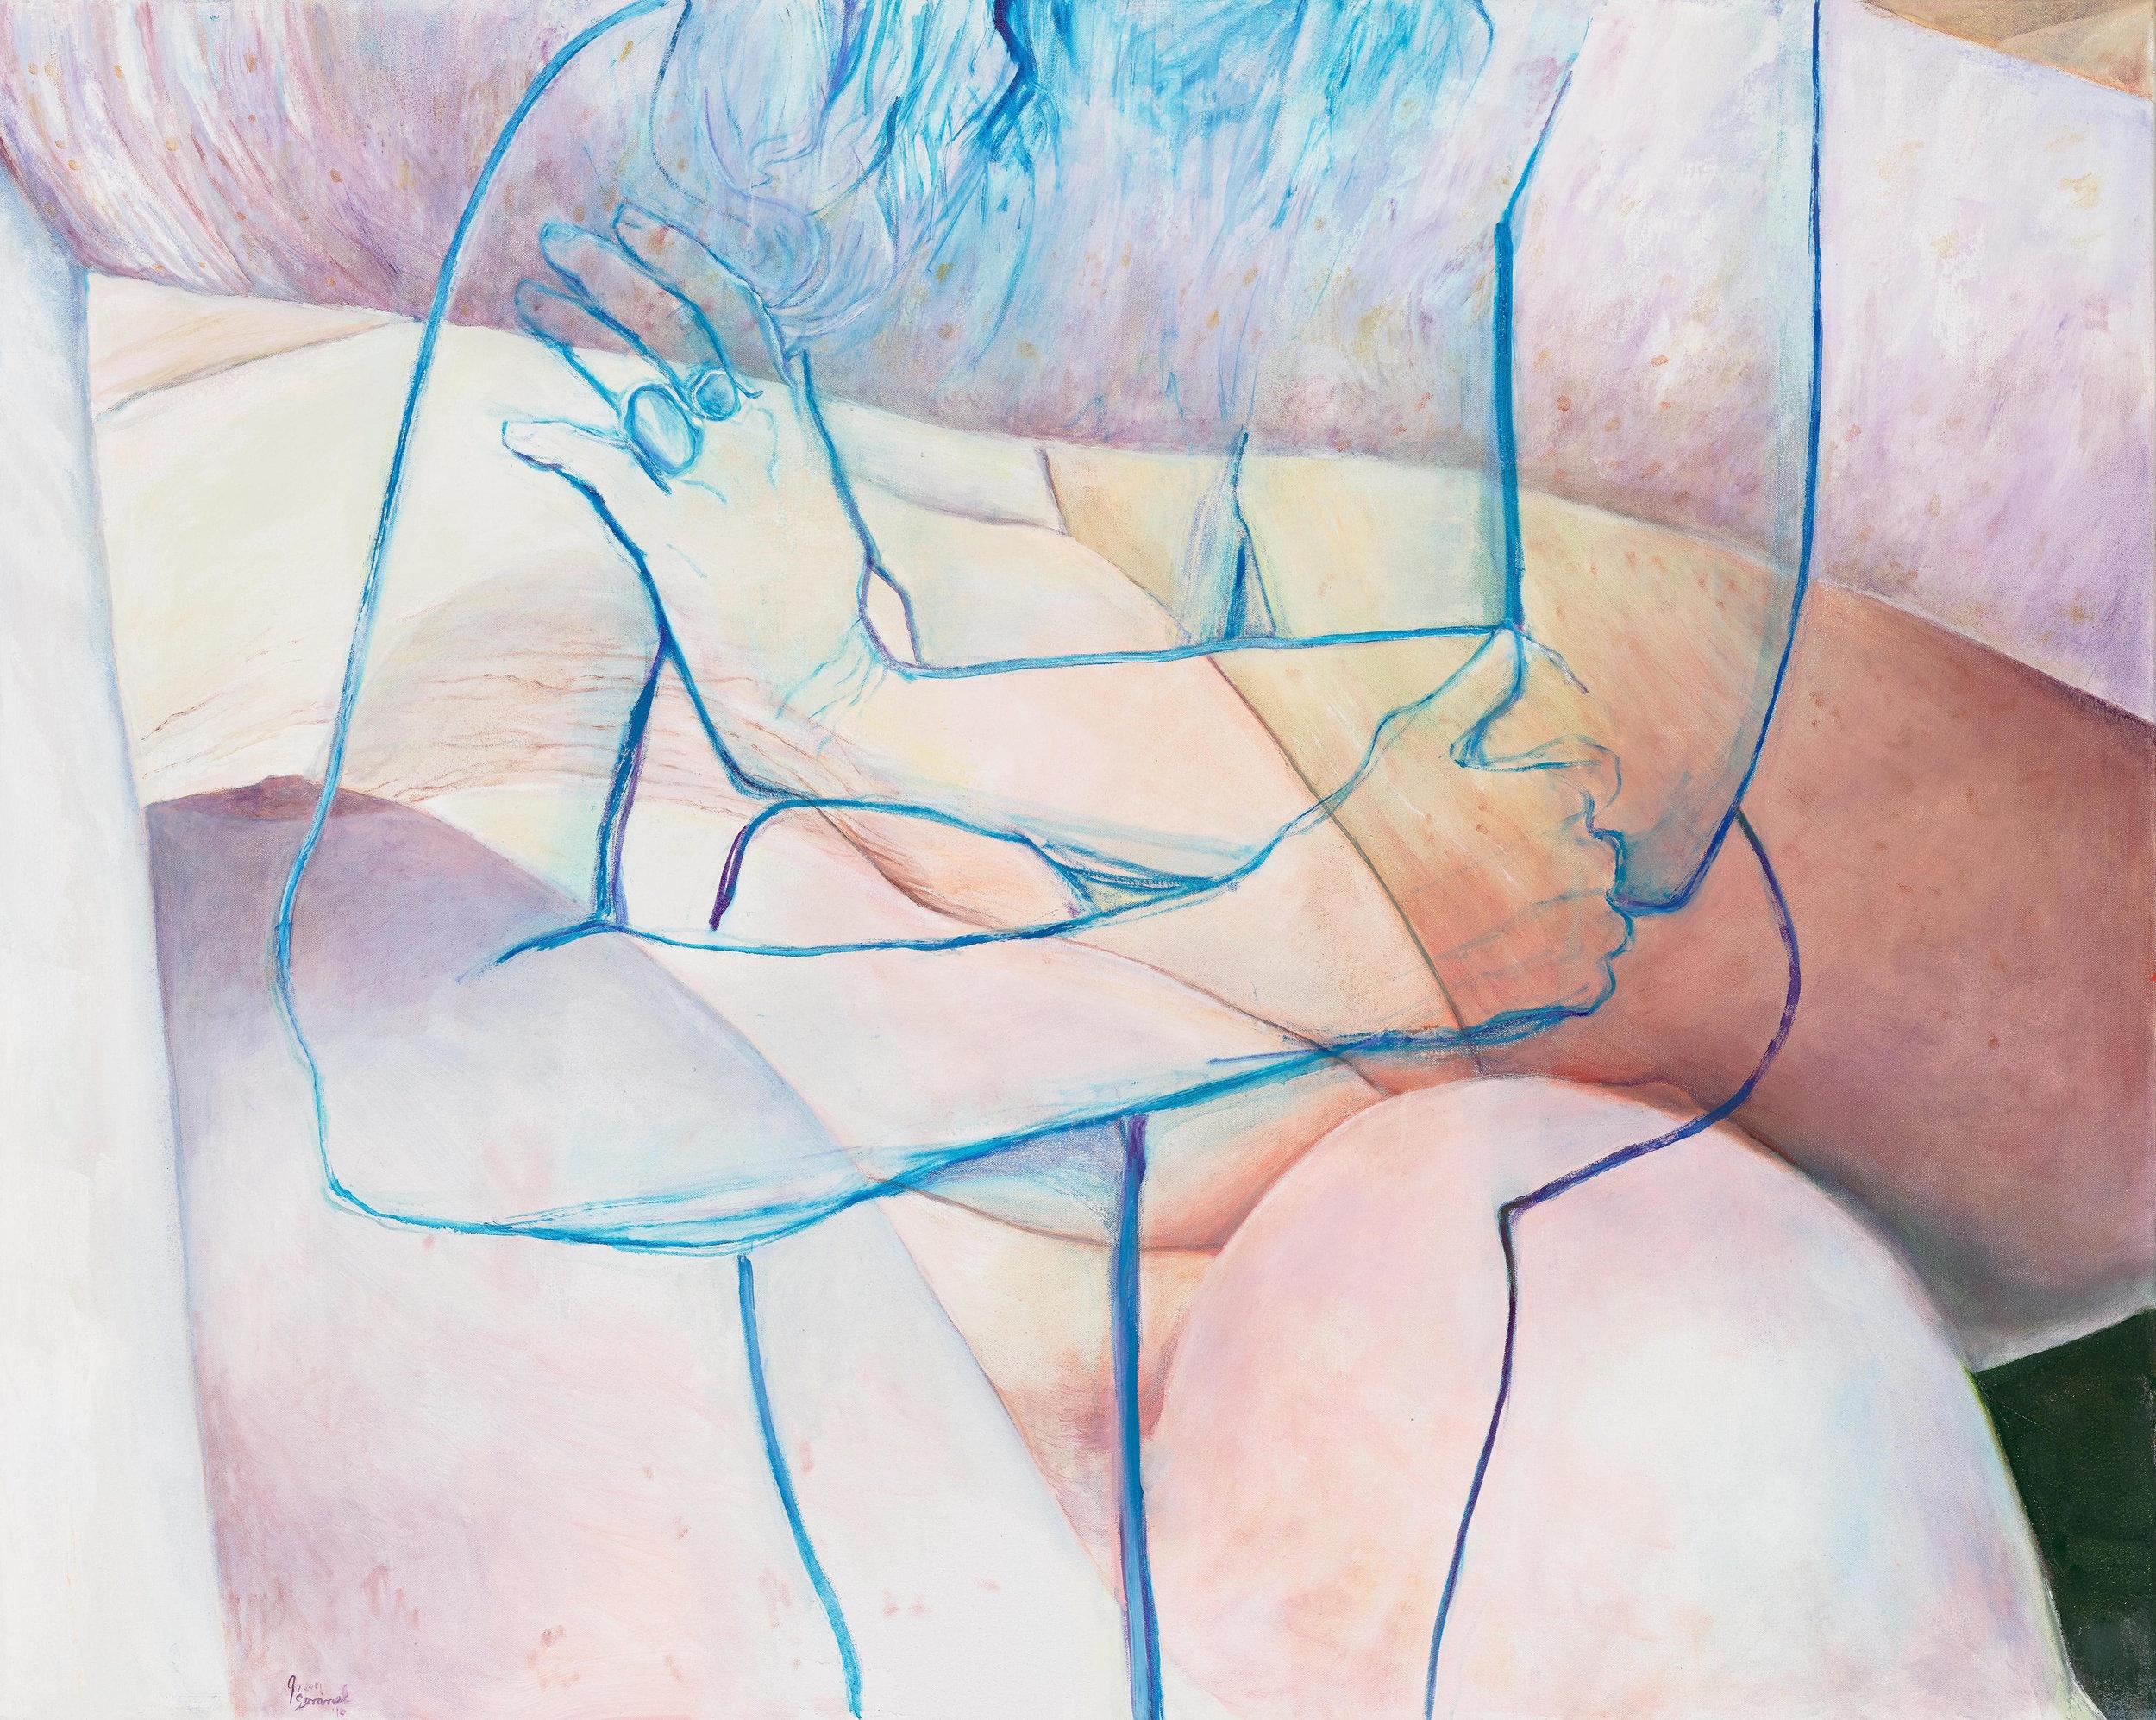 Joan Semmel, Blue Embrace, 2016, Oil on canvas, 60 x 48 in, (152.4h x 121.92w cm) Courtesy Alexander Gray Associates, New York © 2016 Joan Semmel/Artists Rights Society (ARS), New York